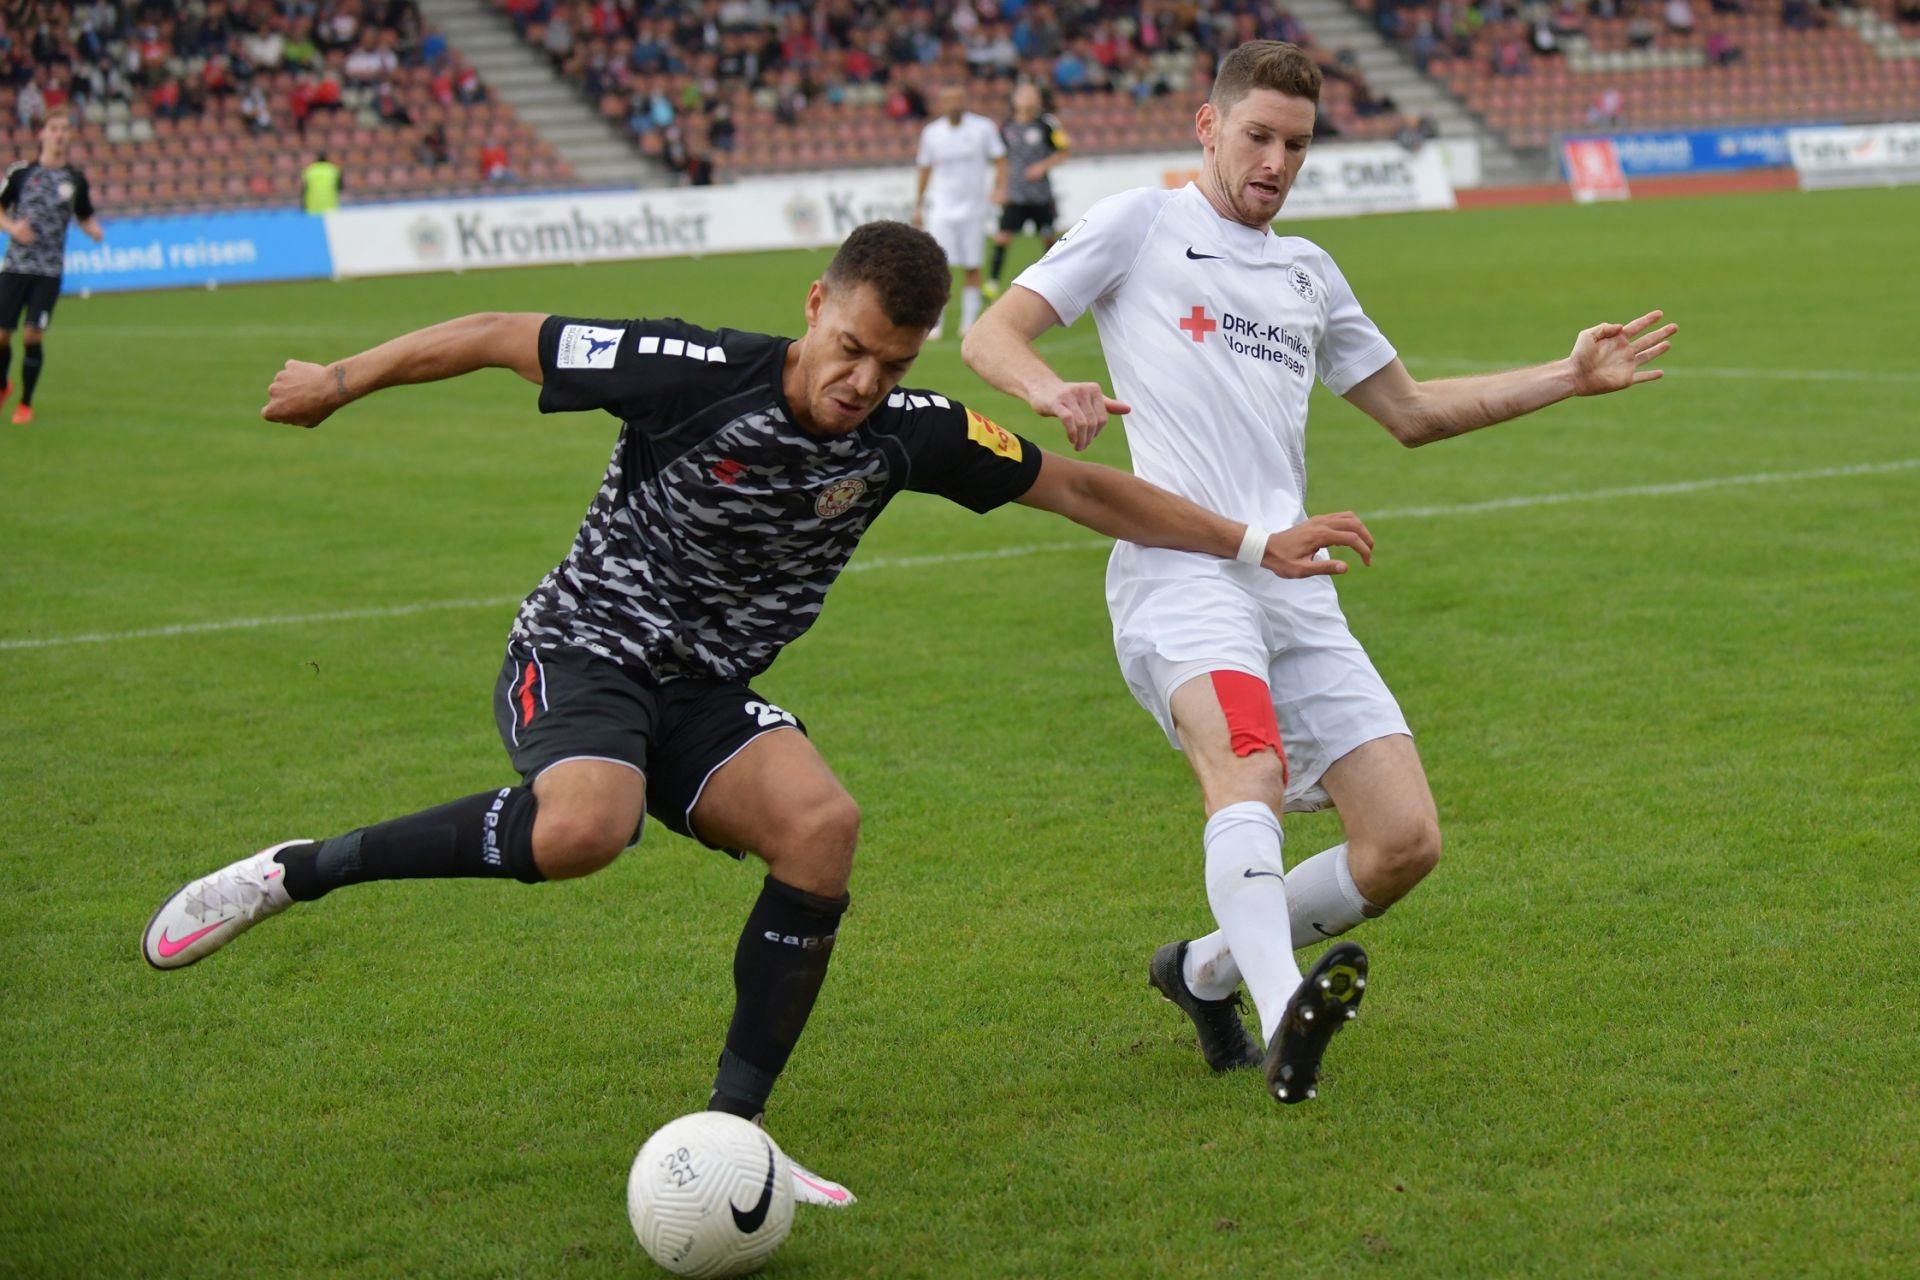 Regionalliga Südwest 2020/21, KSV Hessen Kassel, Rot-Weiss-Koblenz, Endstand 1:1, Lukas Iksal